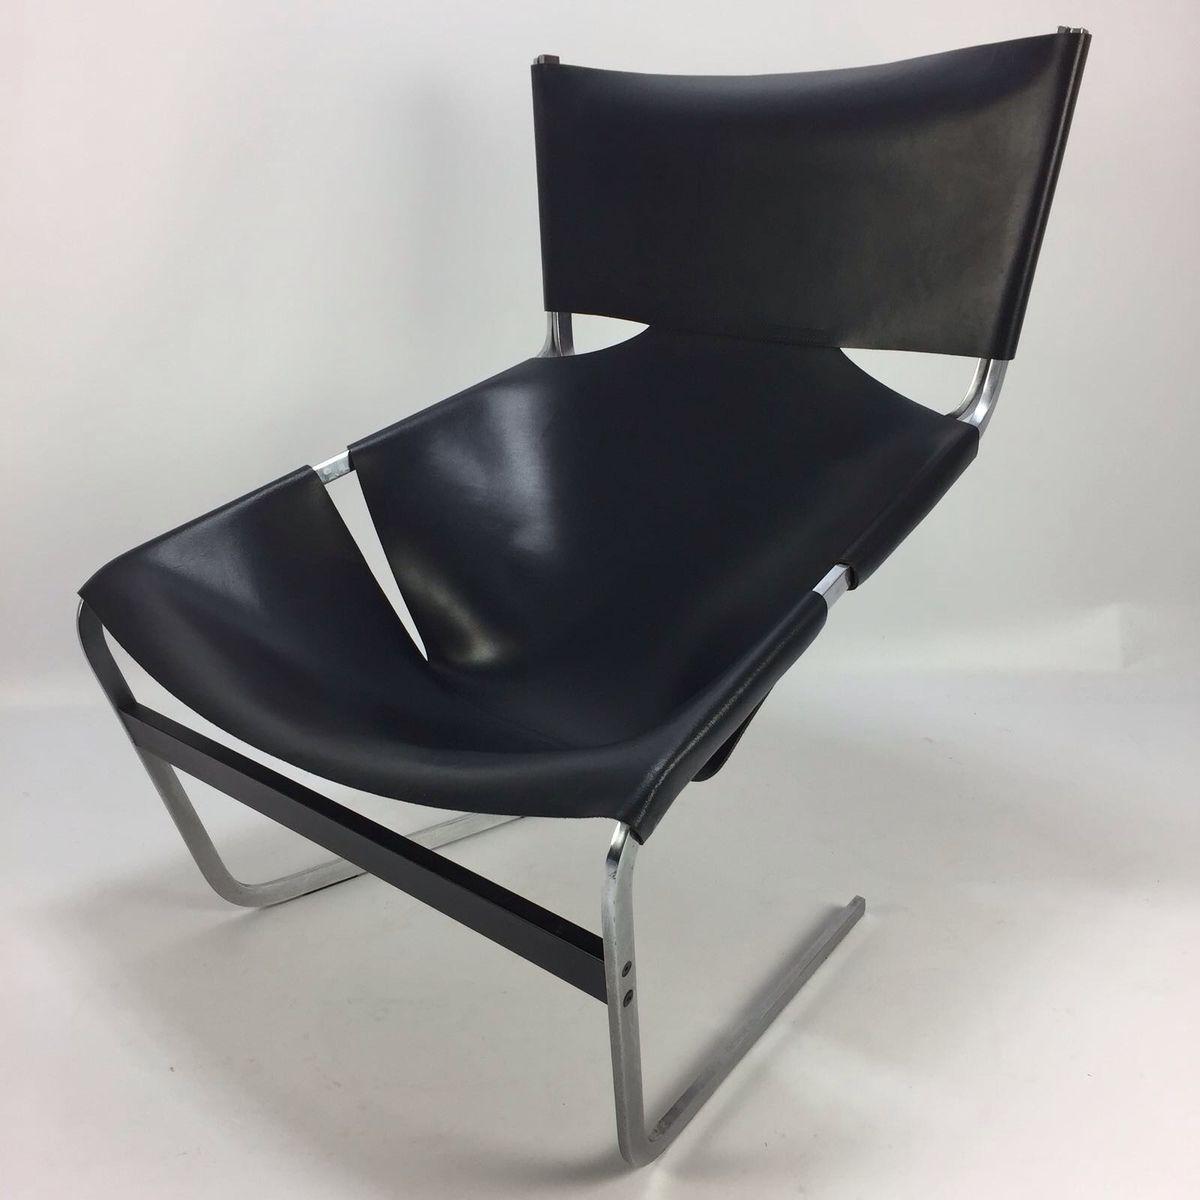 schwarzer vintage modell f444 sessel von pierre paulin f r. Black Bedroom Furniture Sets. Home Design Ideas